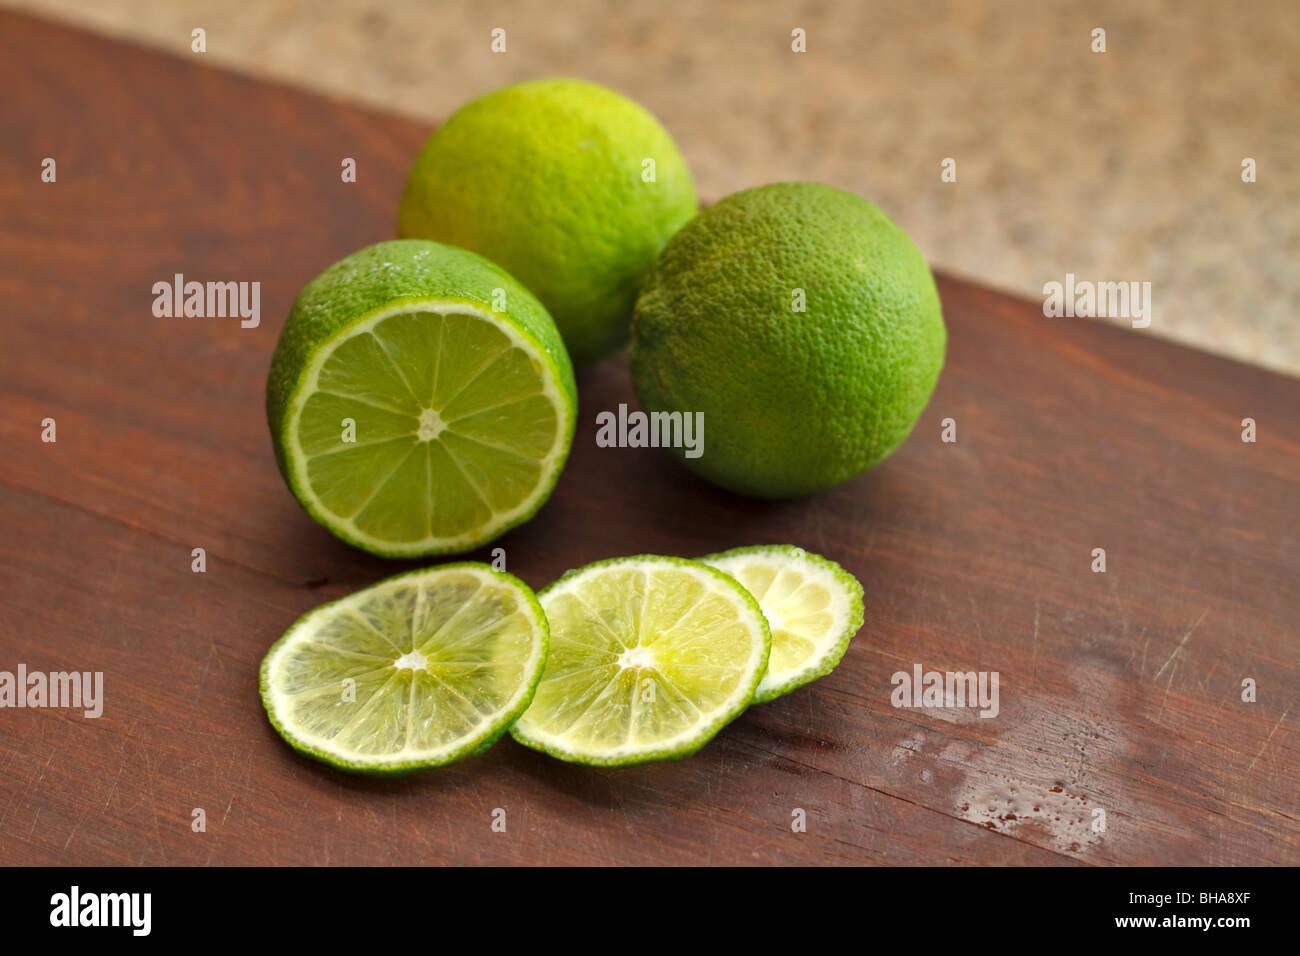 Sliced fresh limes - Stock Image